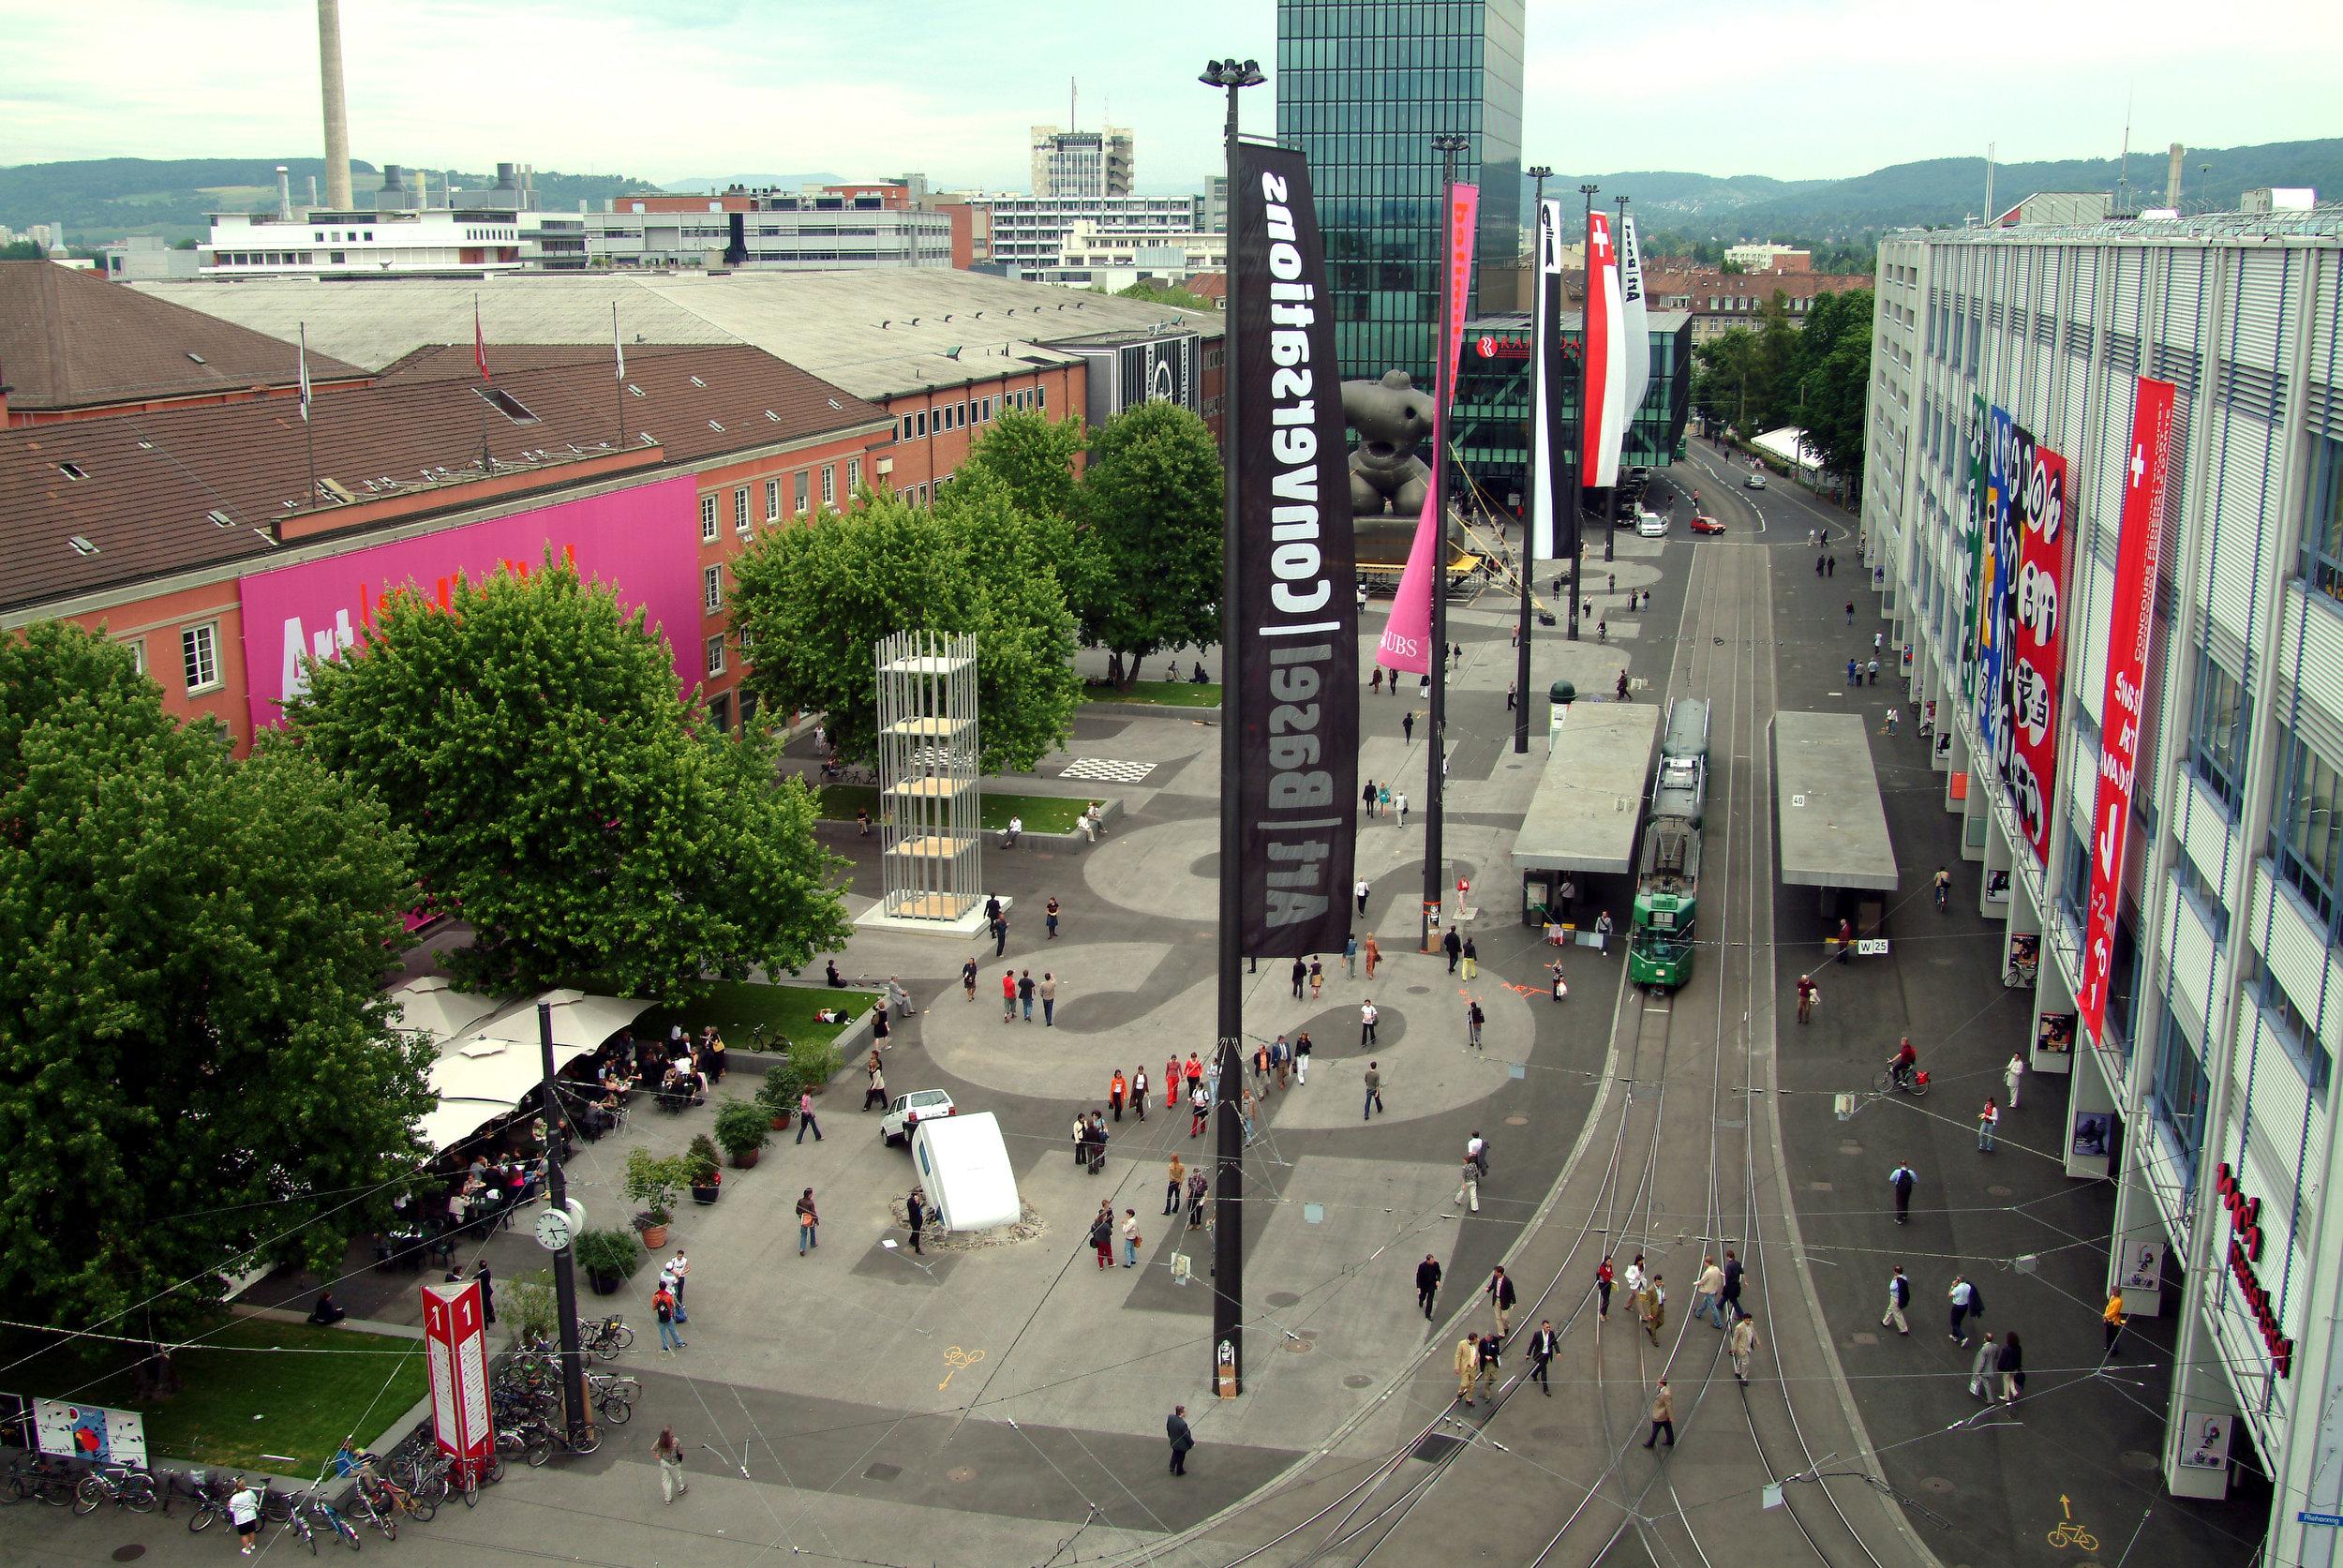 Messeplatz me 02 1.jpg